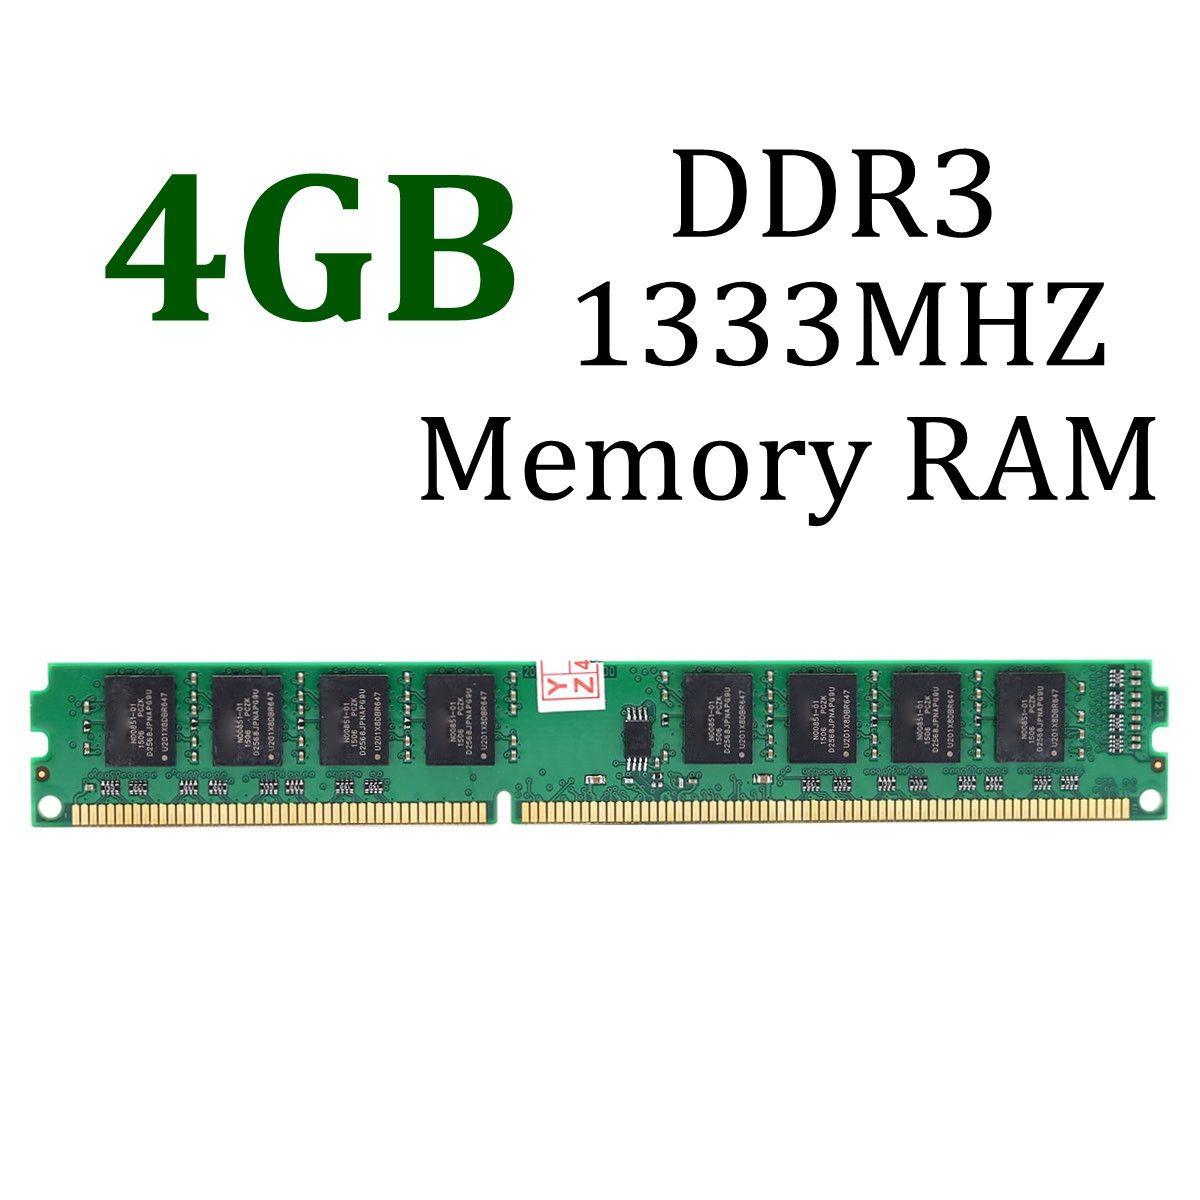 1PC 4GB DDR3 PC3-10600 DDR3-1333 MHZ 240-Pin Desktop PC DIMM Memory 1.5V Module New Electric Board